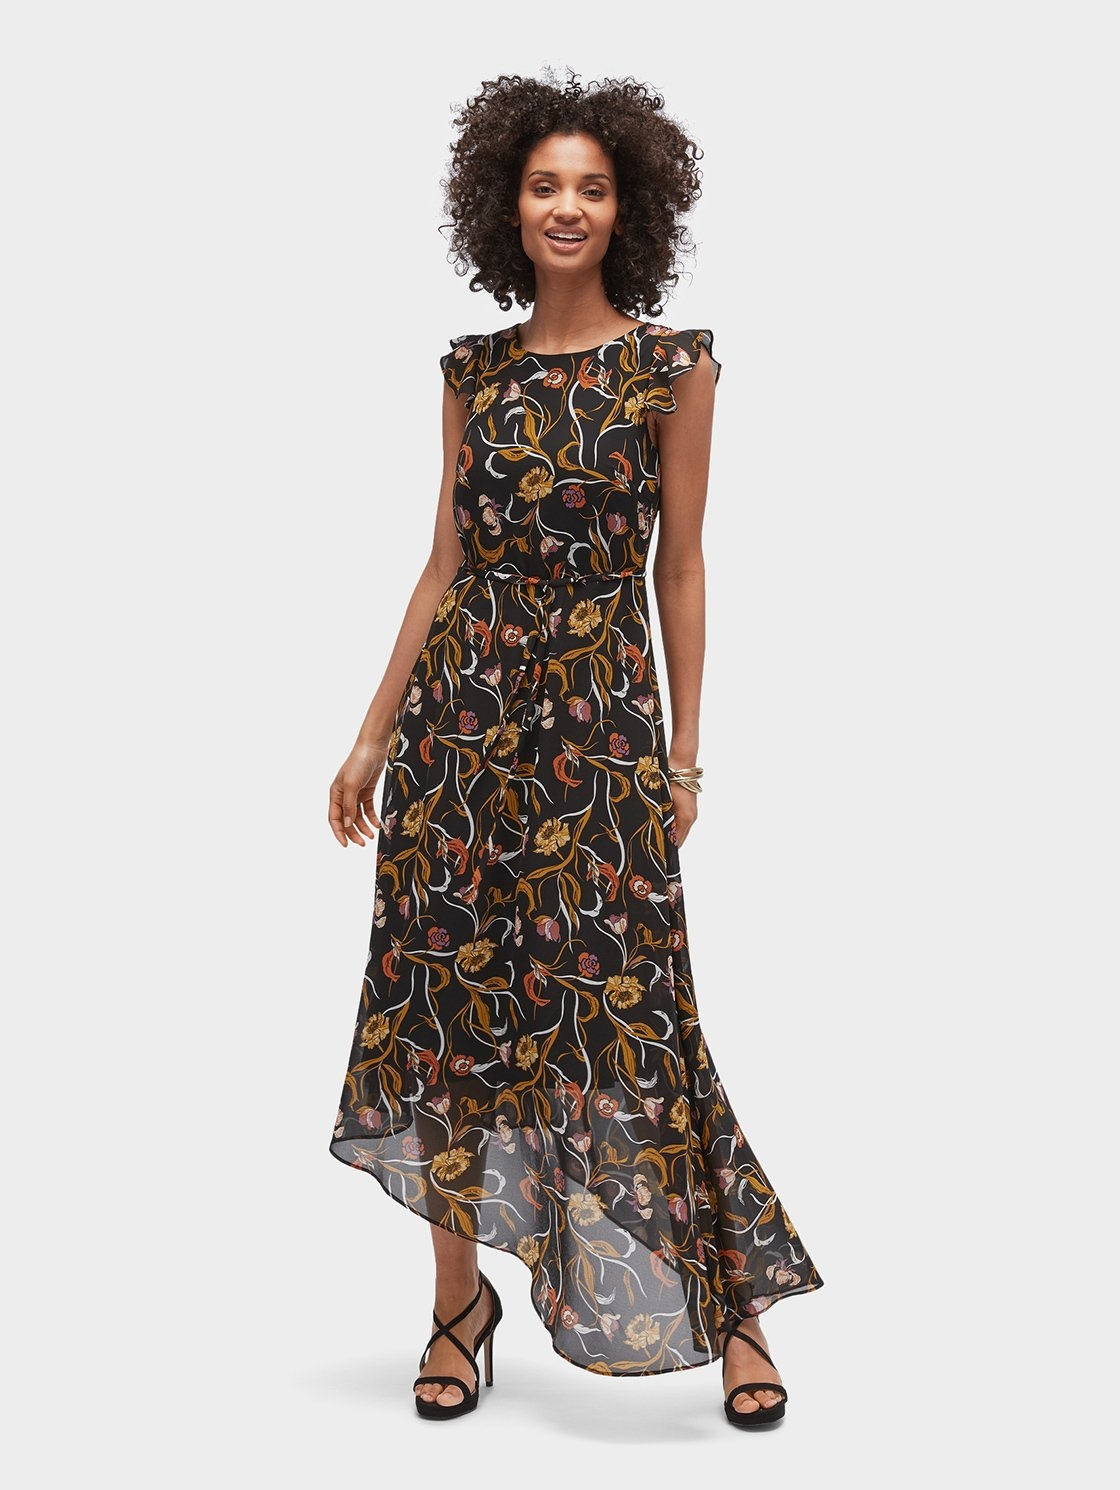 Maxi Jurk Chiffon.Tom Tailor Maxi Jurk Asymmetrisches Chiffon Kleid Mit Floralem